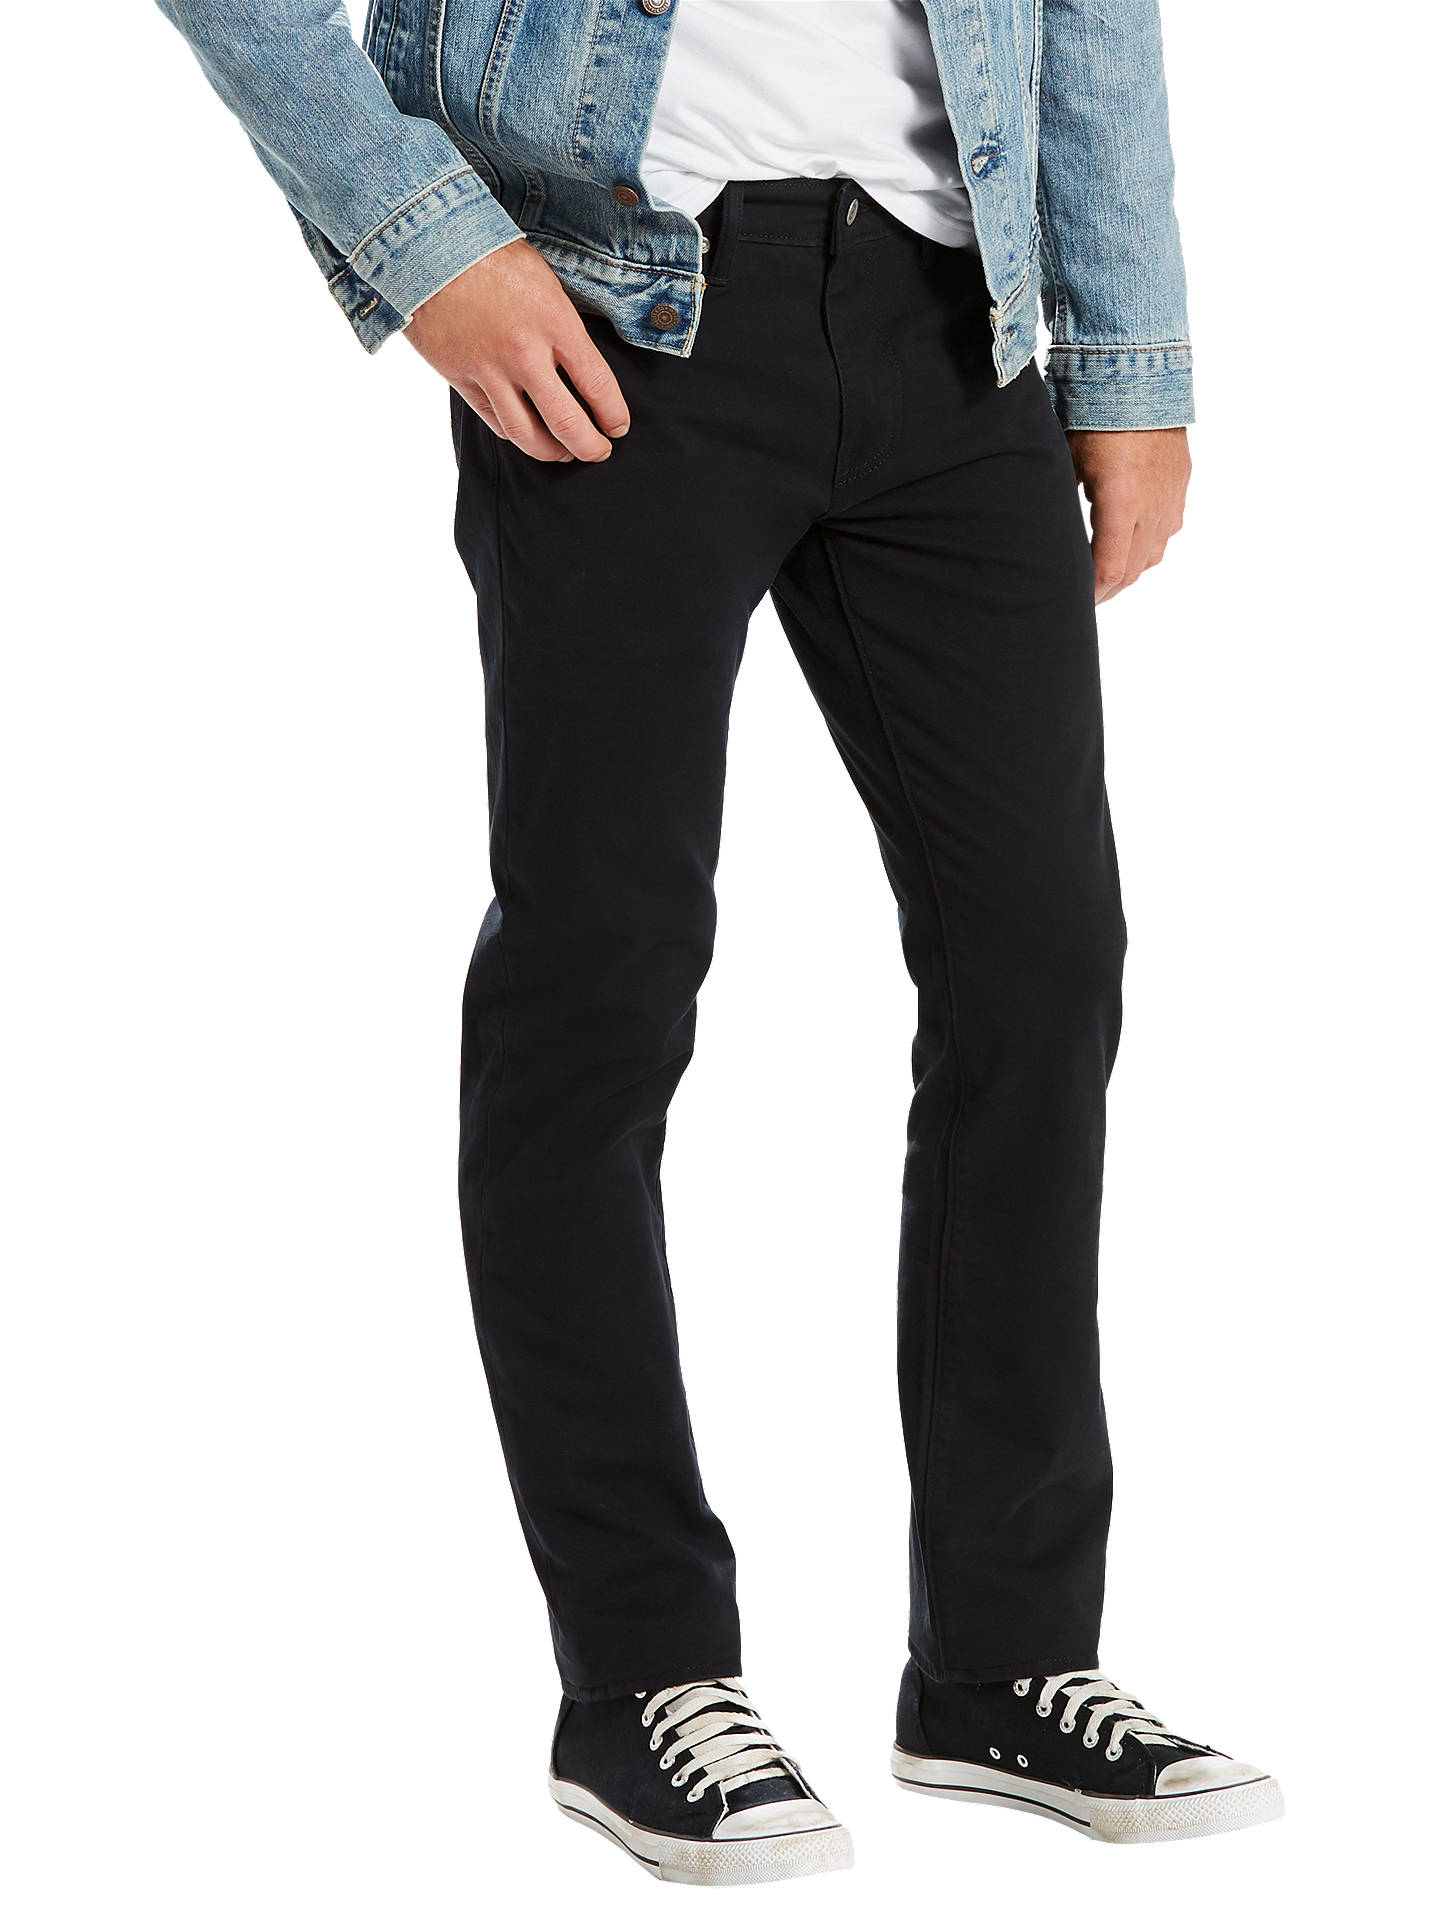 4eb175b4b71 Buy Levi s 511 Slim Fit Jeans